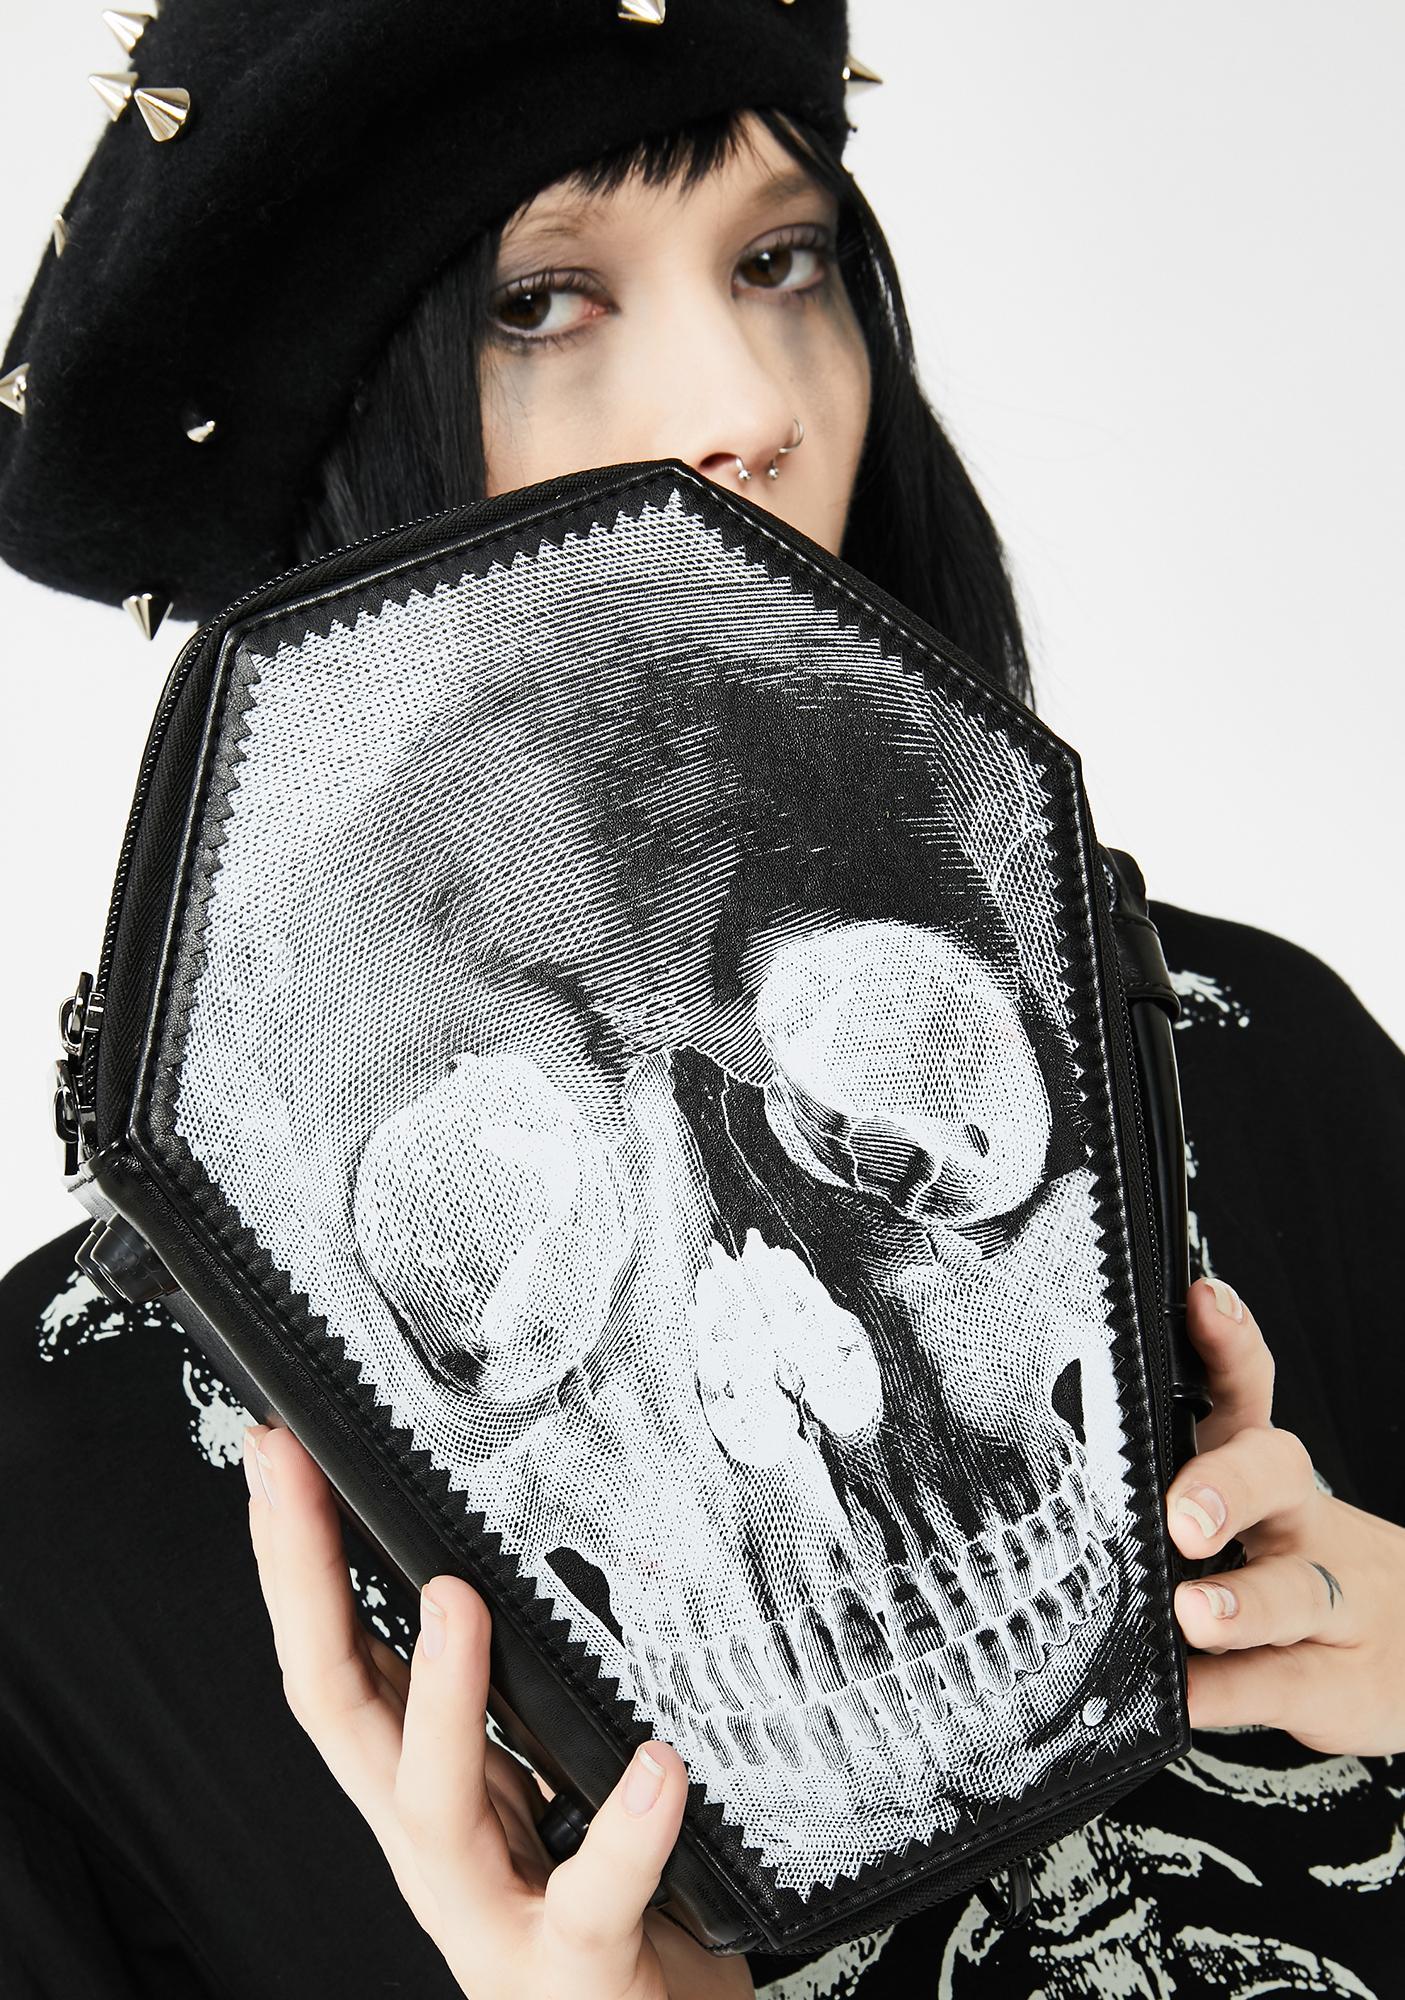 Kreepsville 666 Anatomical Skull Coffin Purse Bag